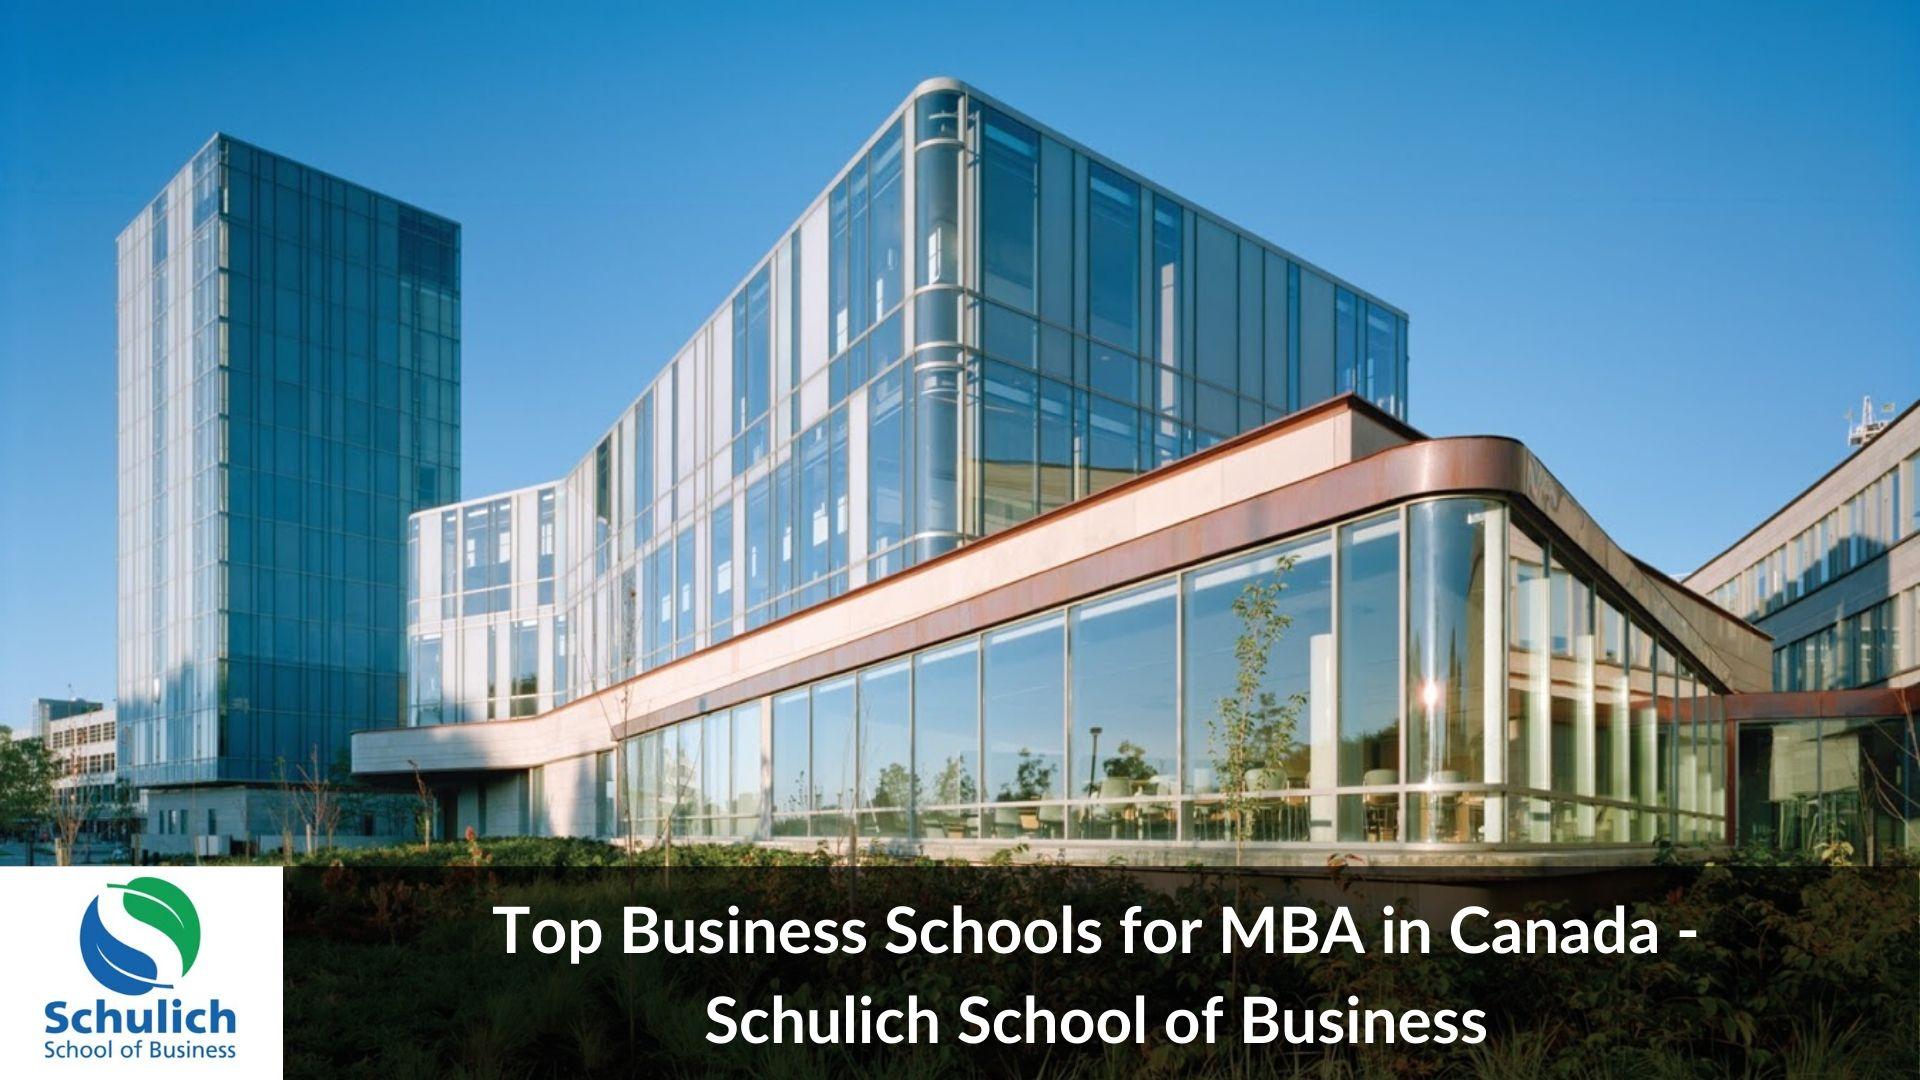 Top MBA universities in Canada - Schulich school of business